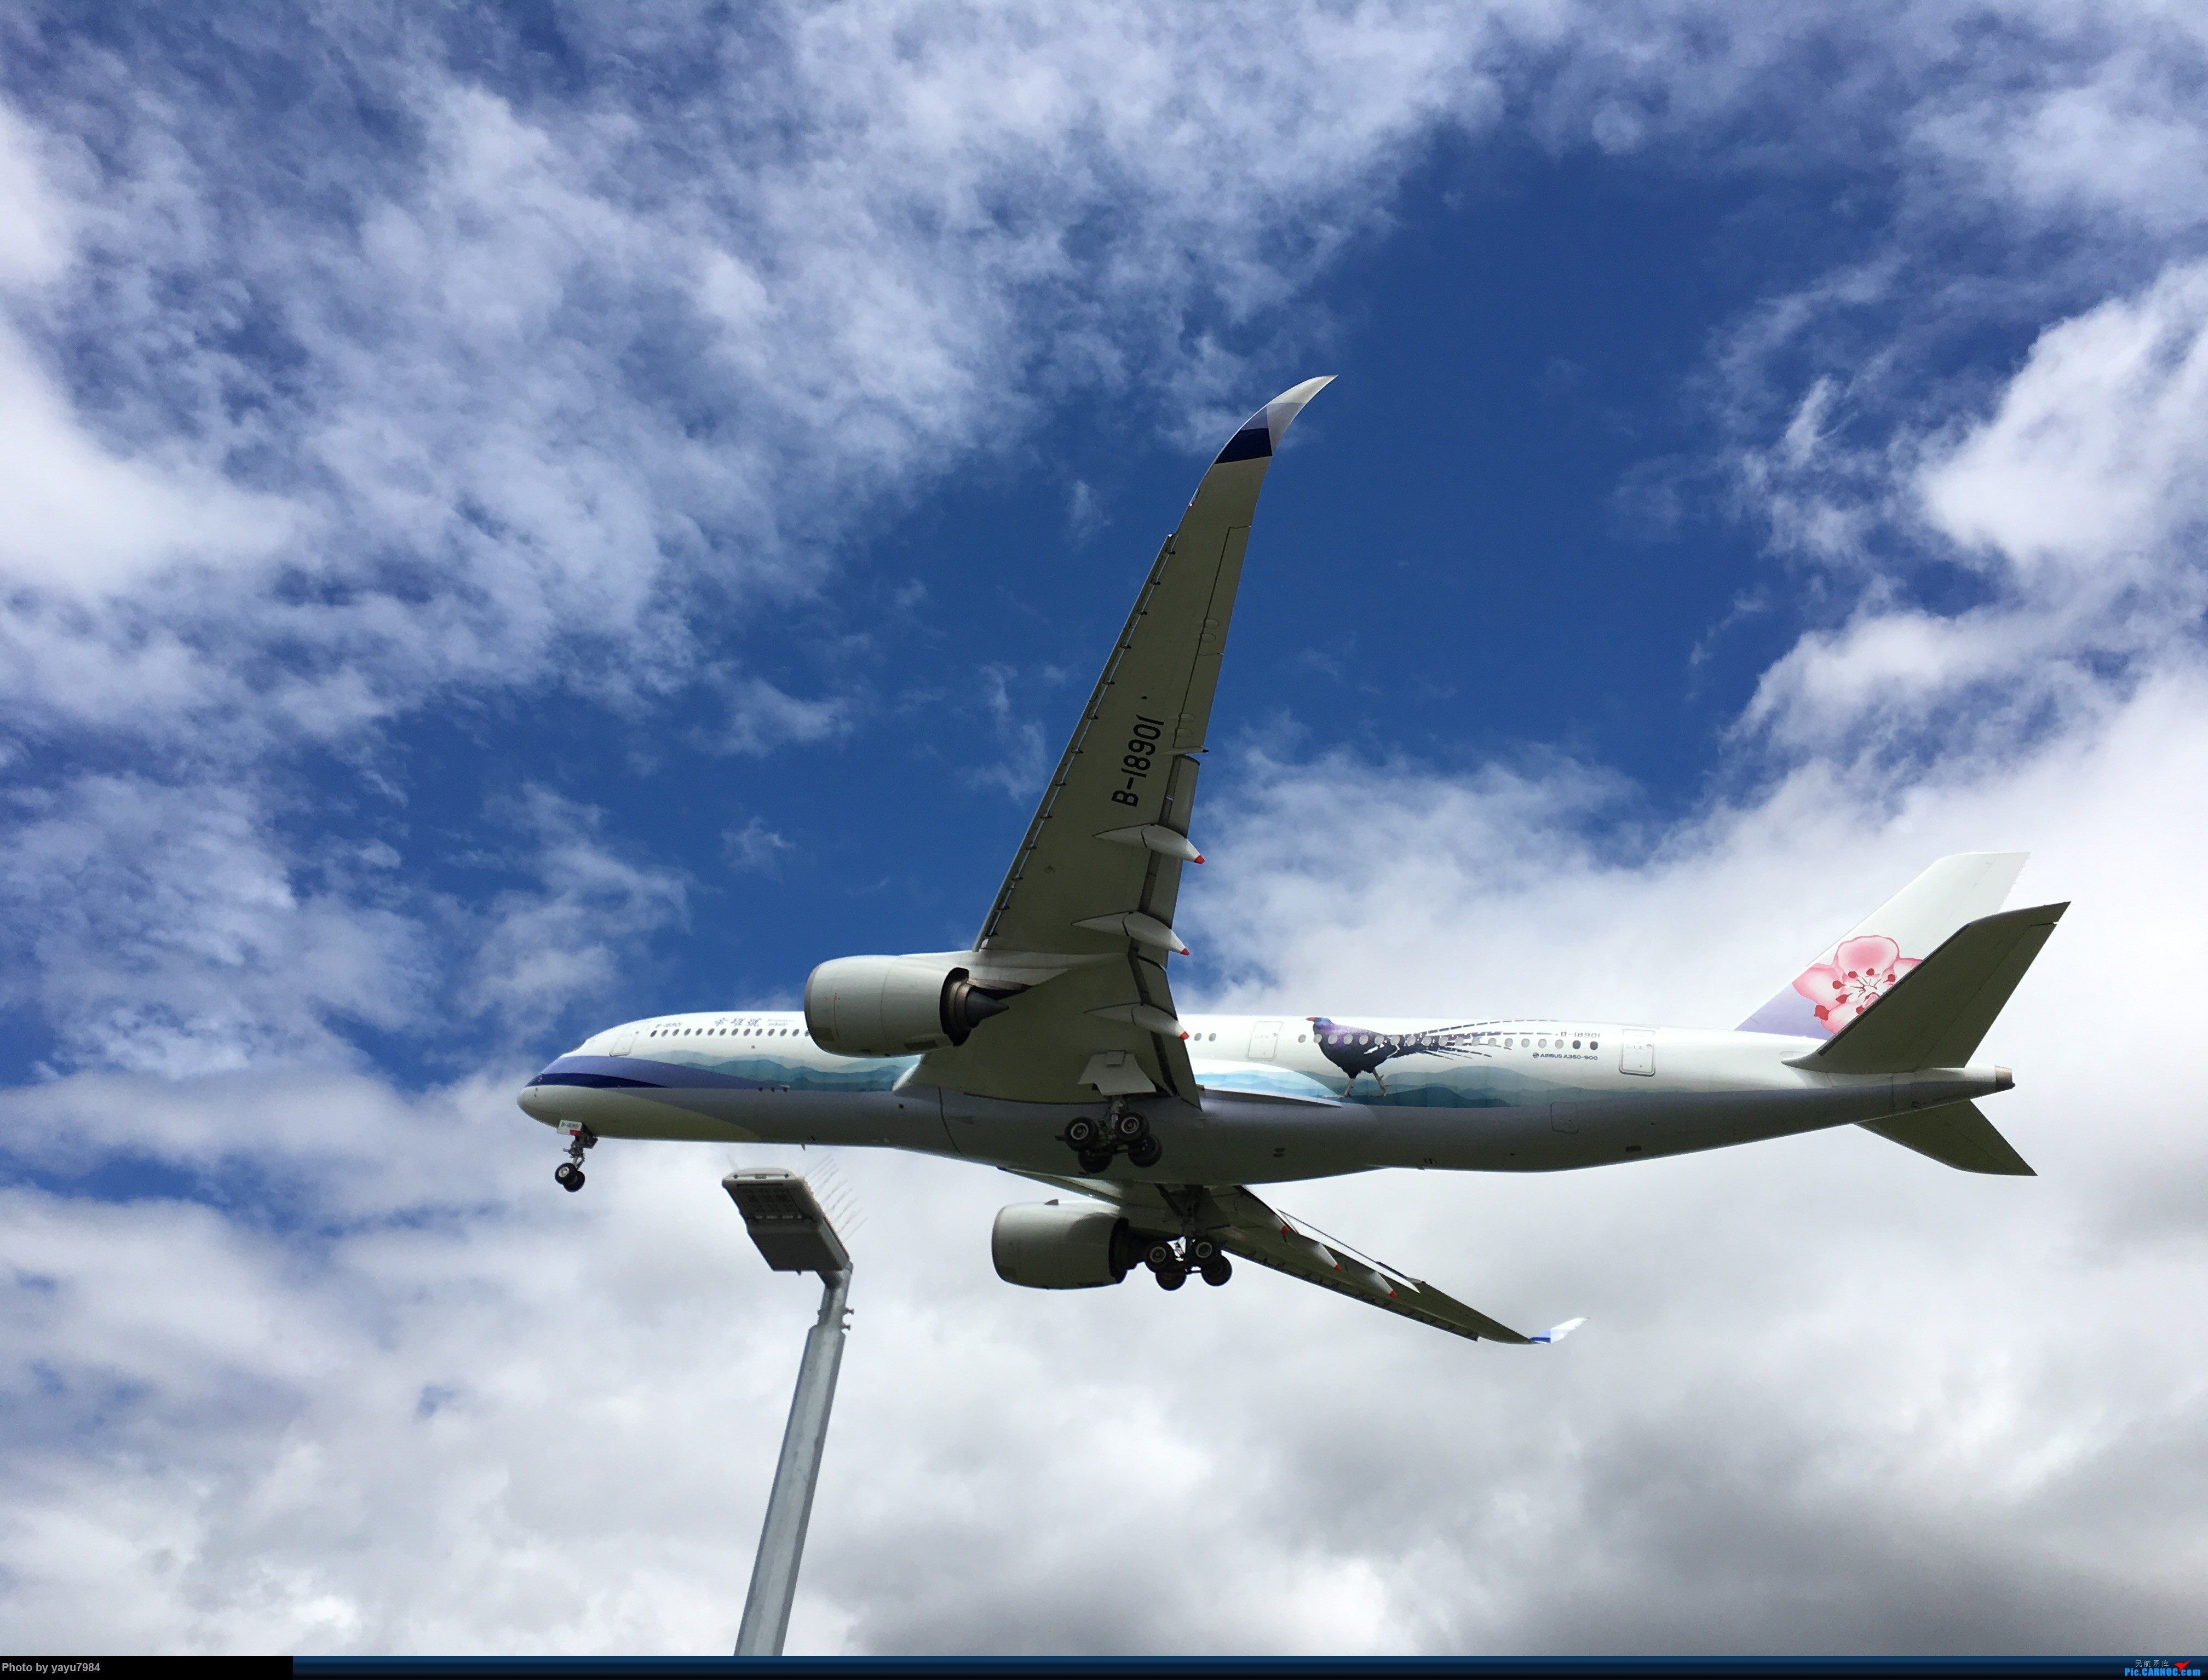 Re:[原创][SYD] 华航A350帝雉号首航悉尼 + 村里的其他常客 AIRBUS A350-900 B-18901 澳大利亚悉尼金斯福德·史密斯机场